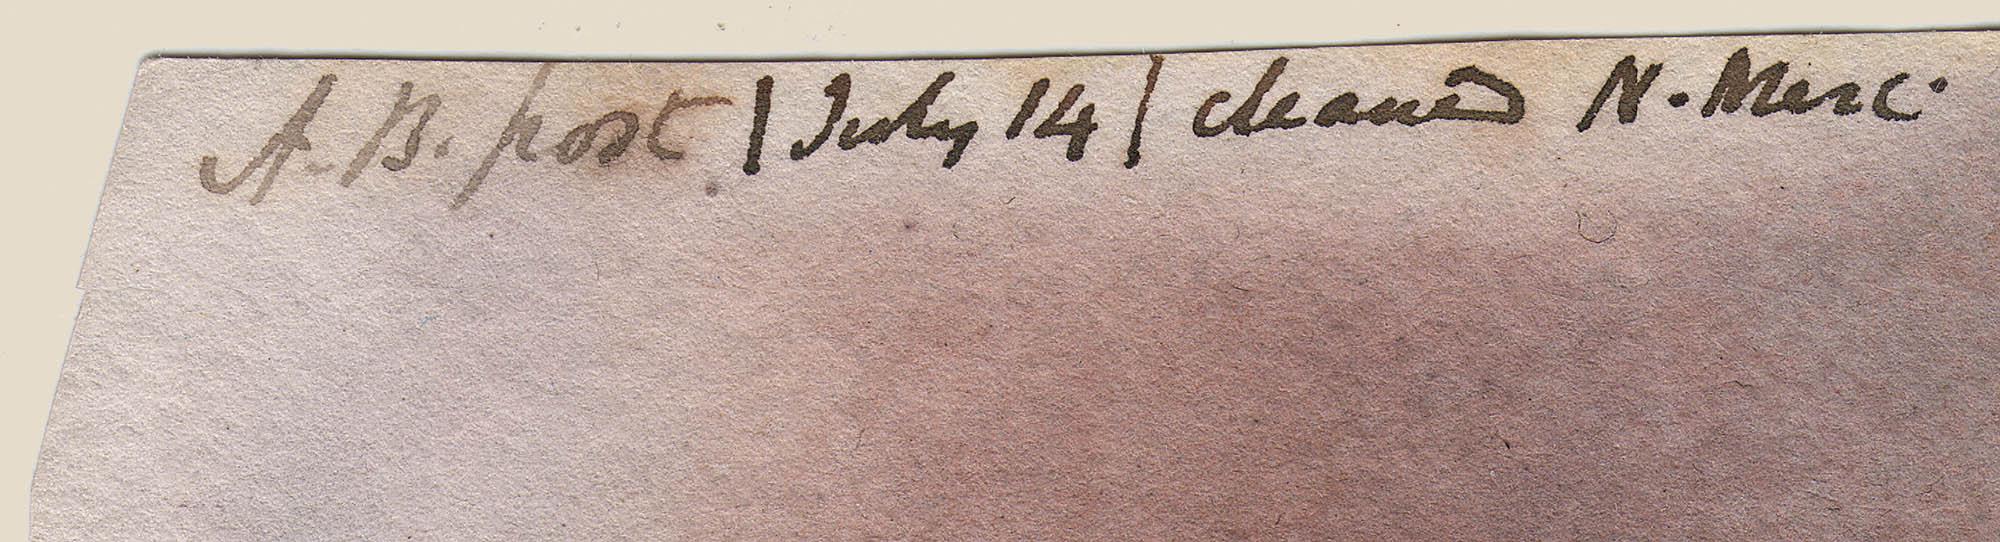 sc2304-1995_206_29-verso-detail